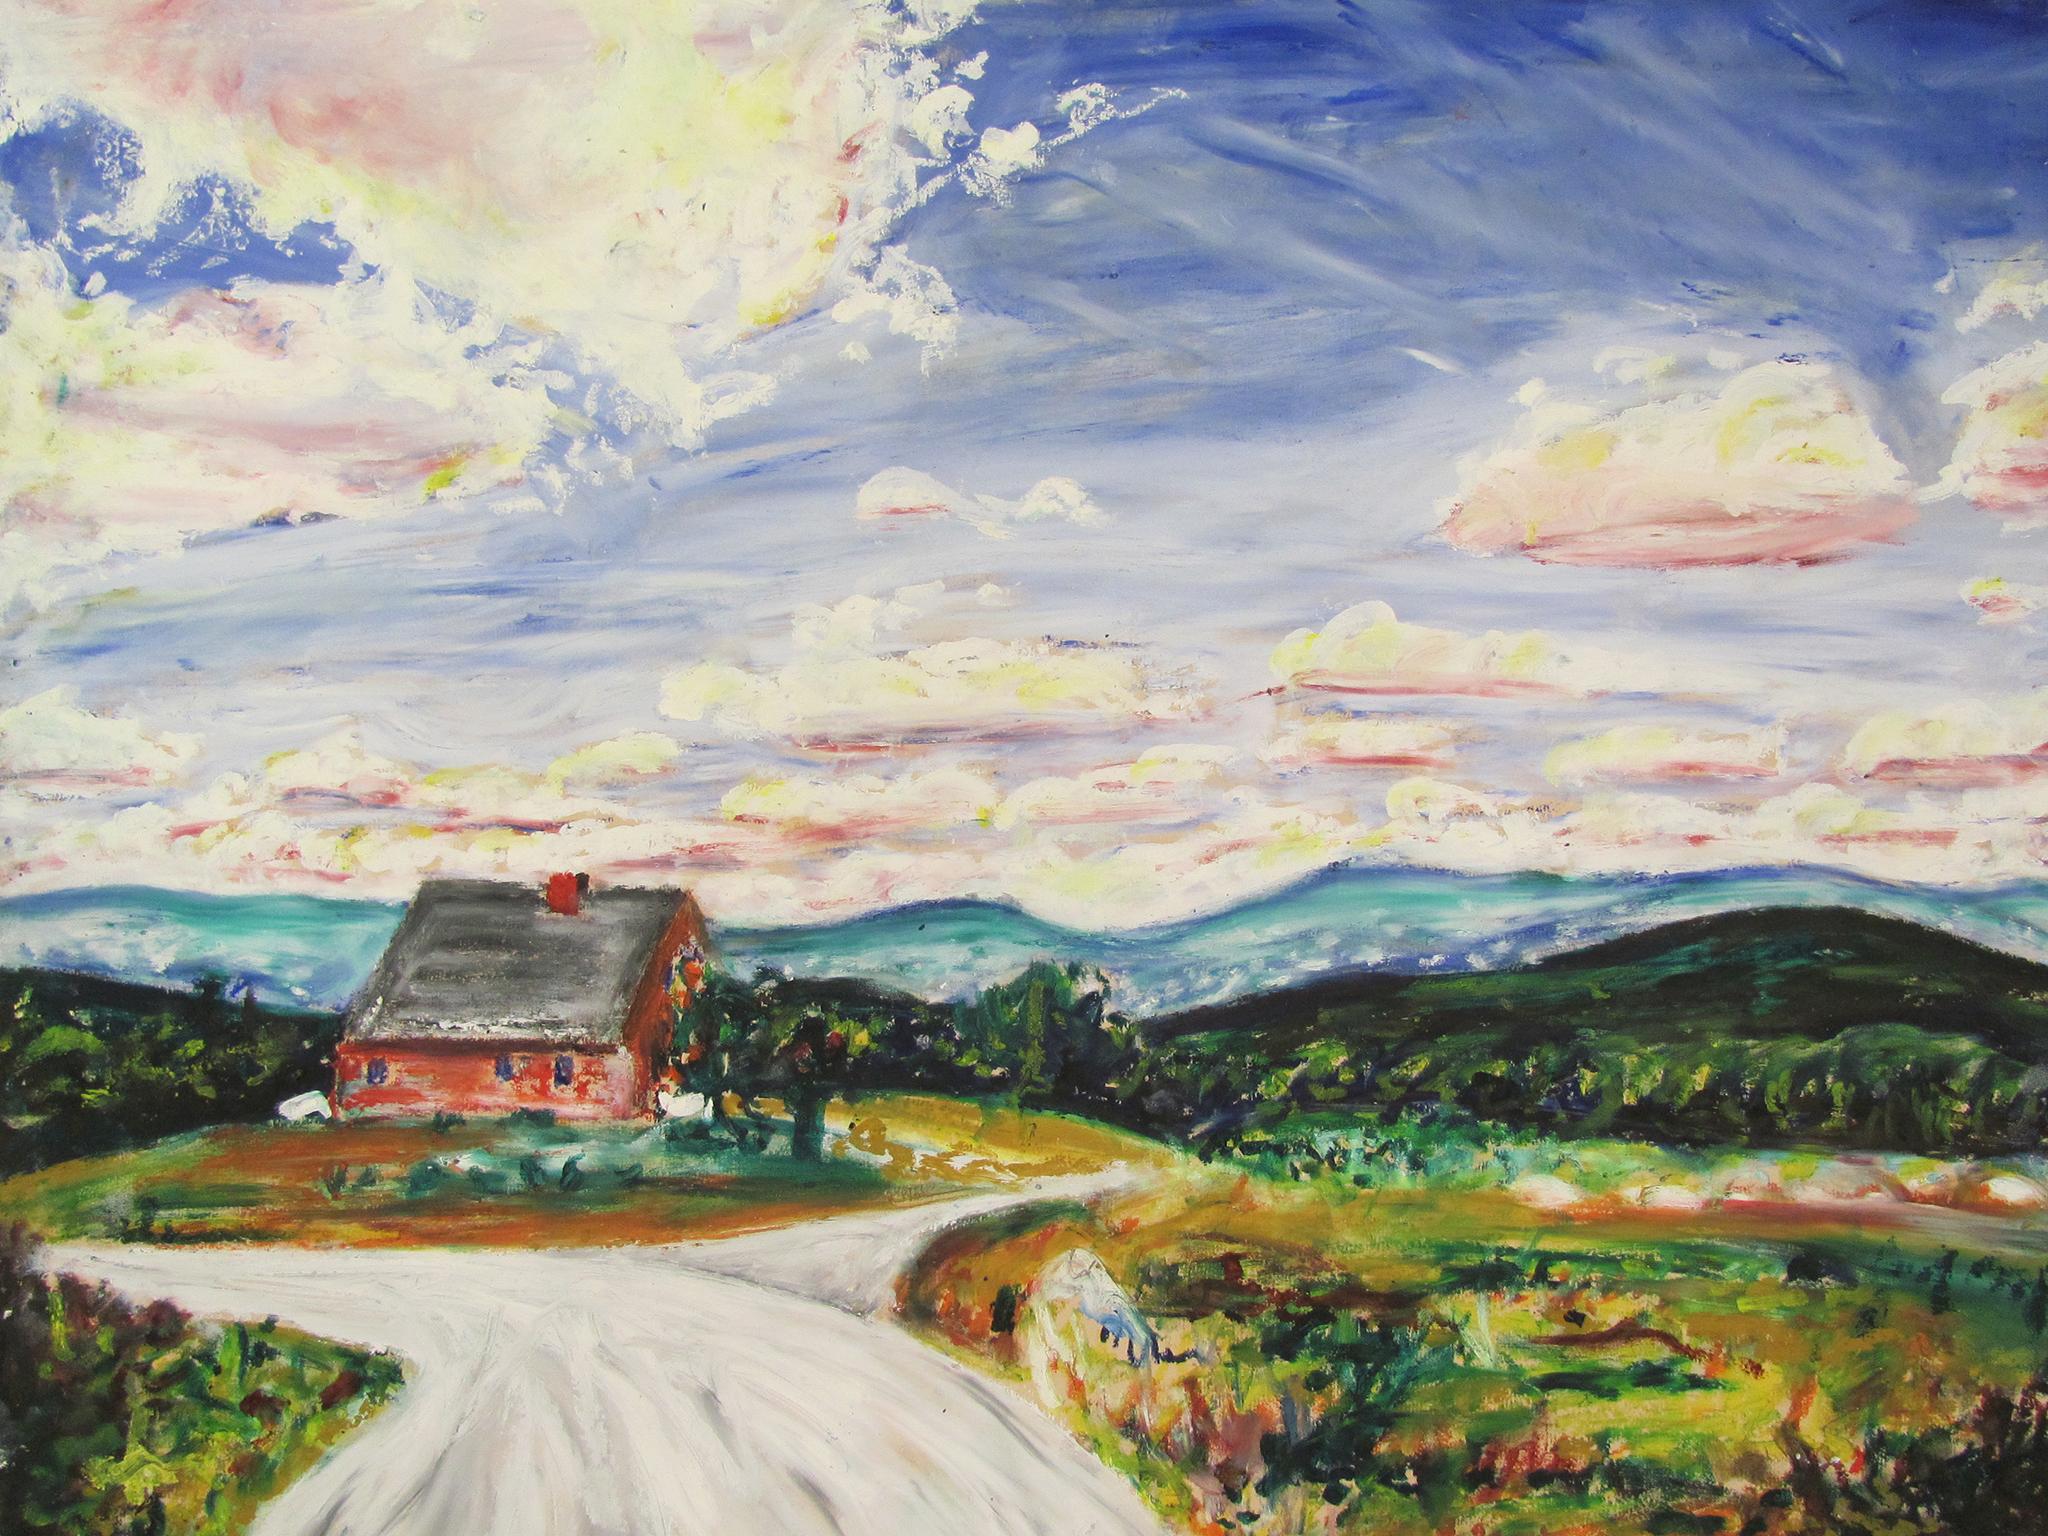 Maine Doe Selects Student Artwork For Mlti Screensavers Maine Doe